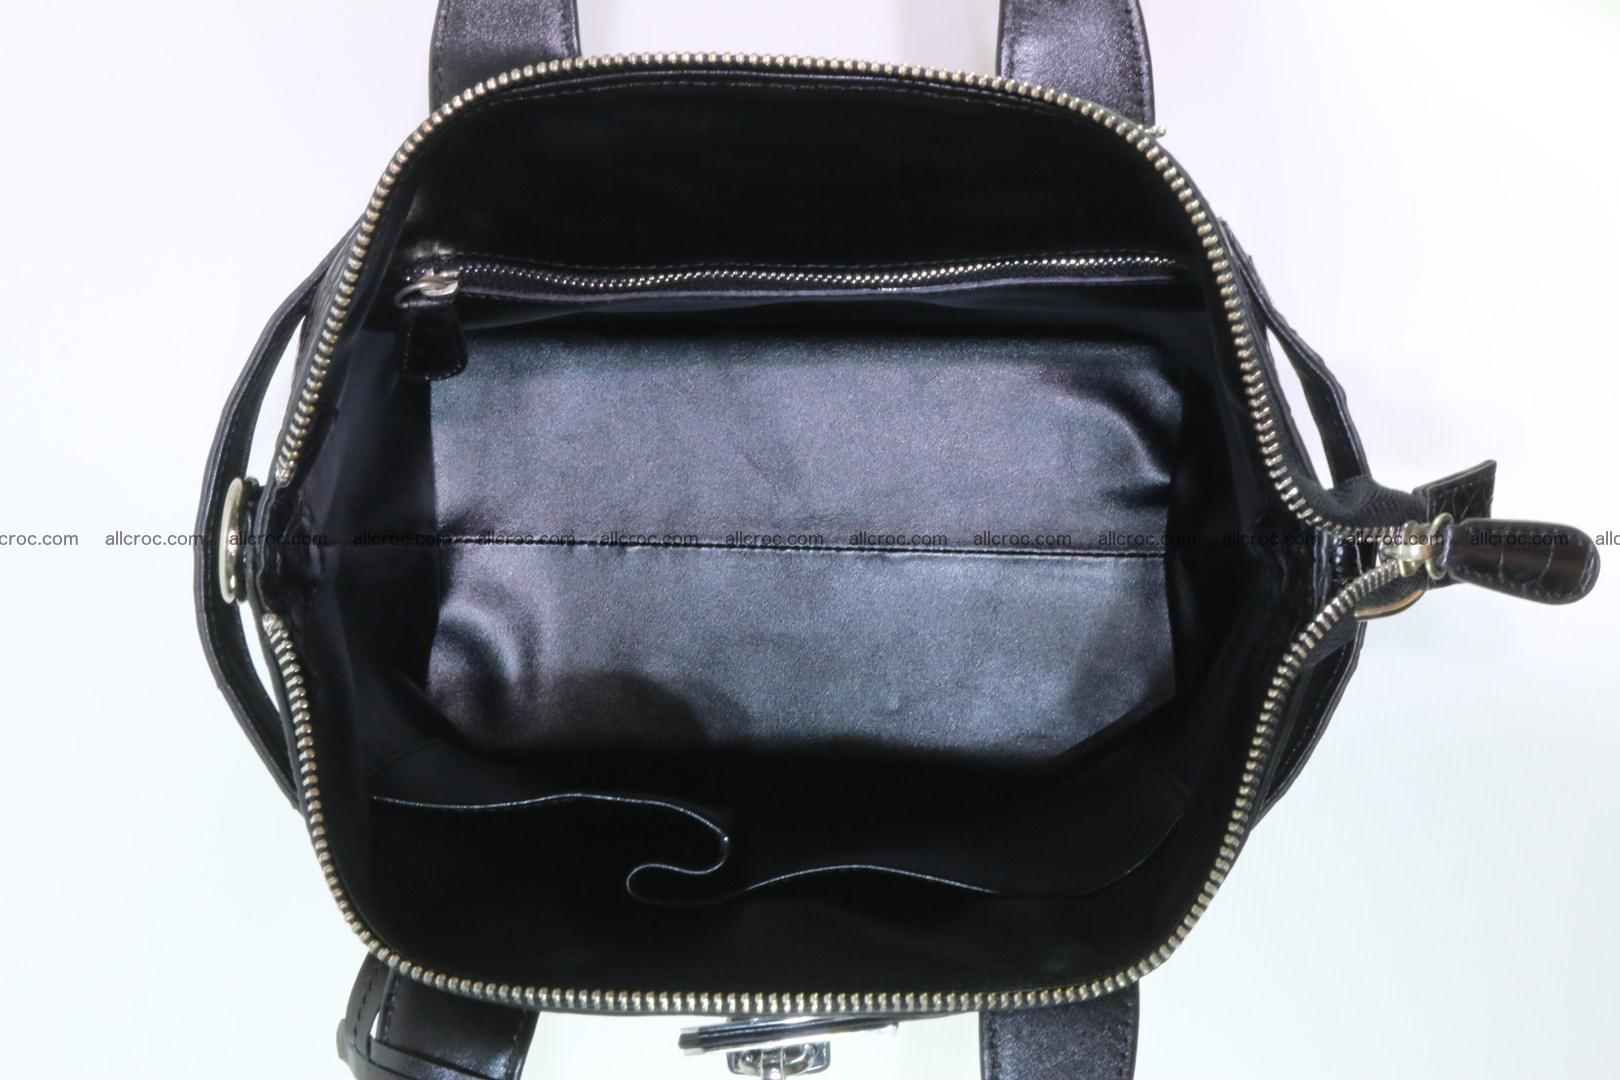 Genuine crocodile handbag for ladies 051 Foto 13